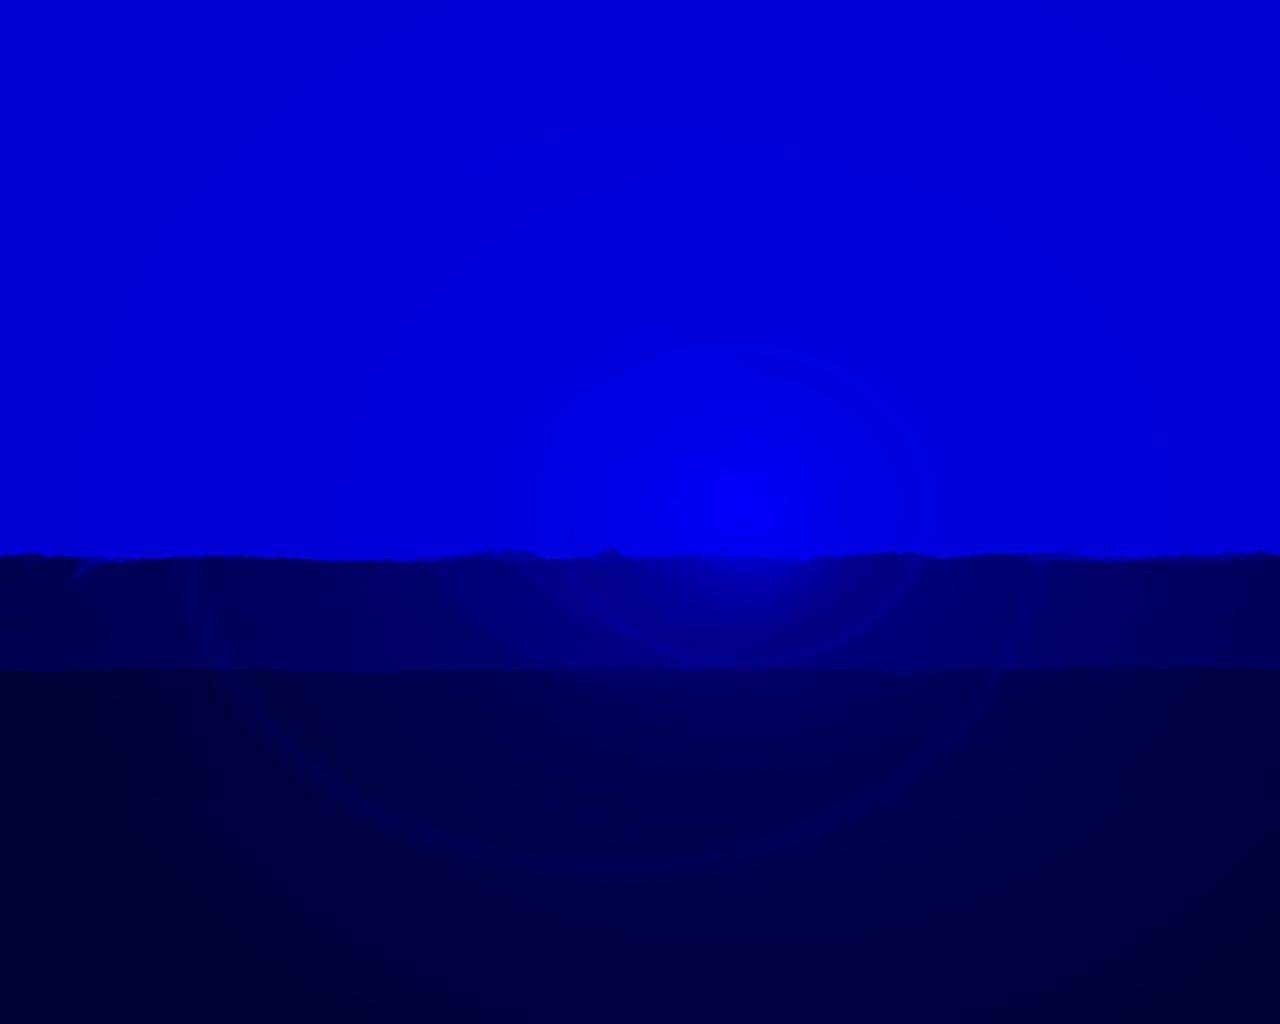 Azules Fondo Degradado Azul Marino